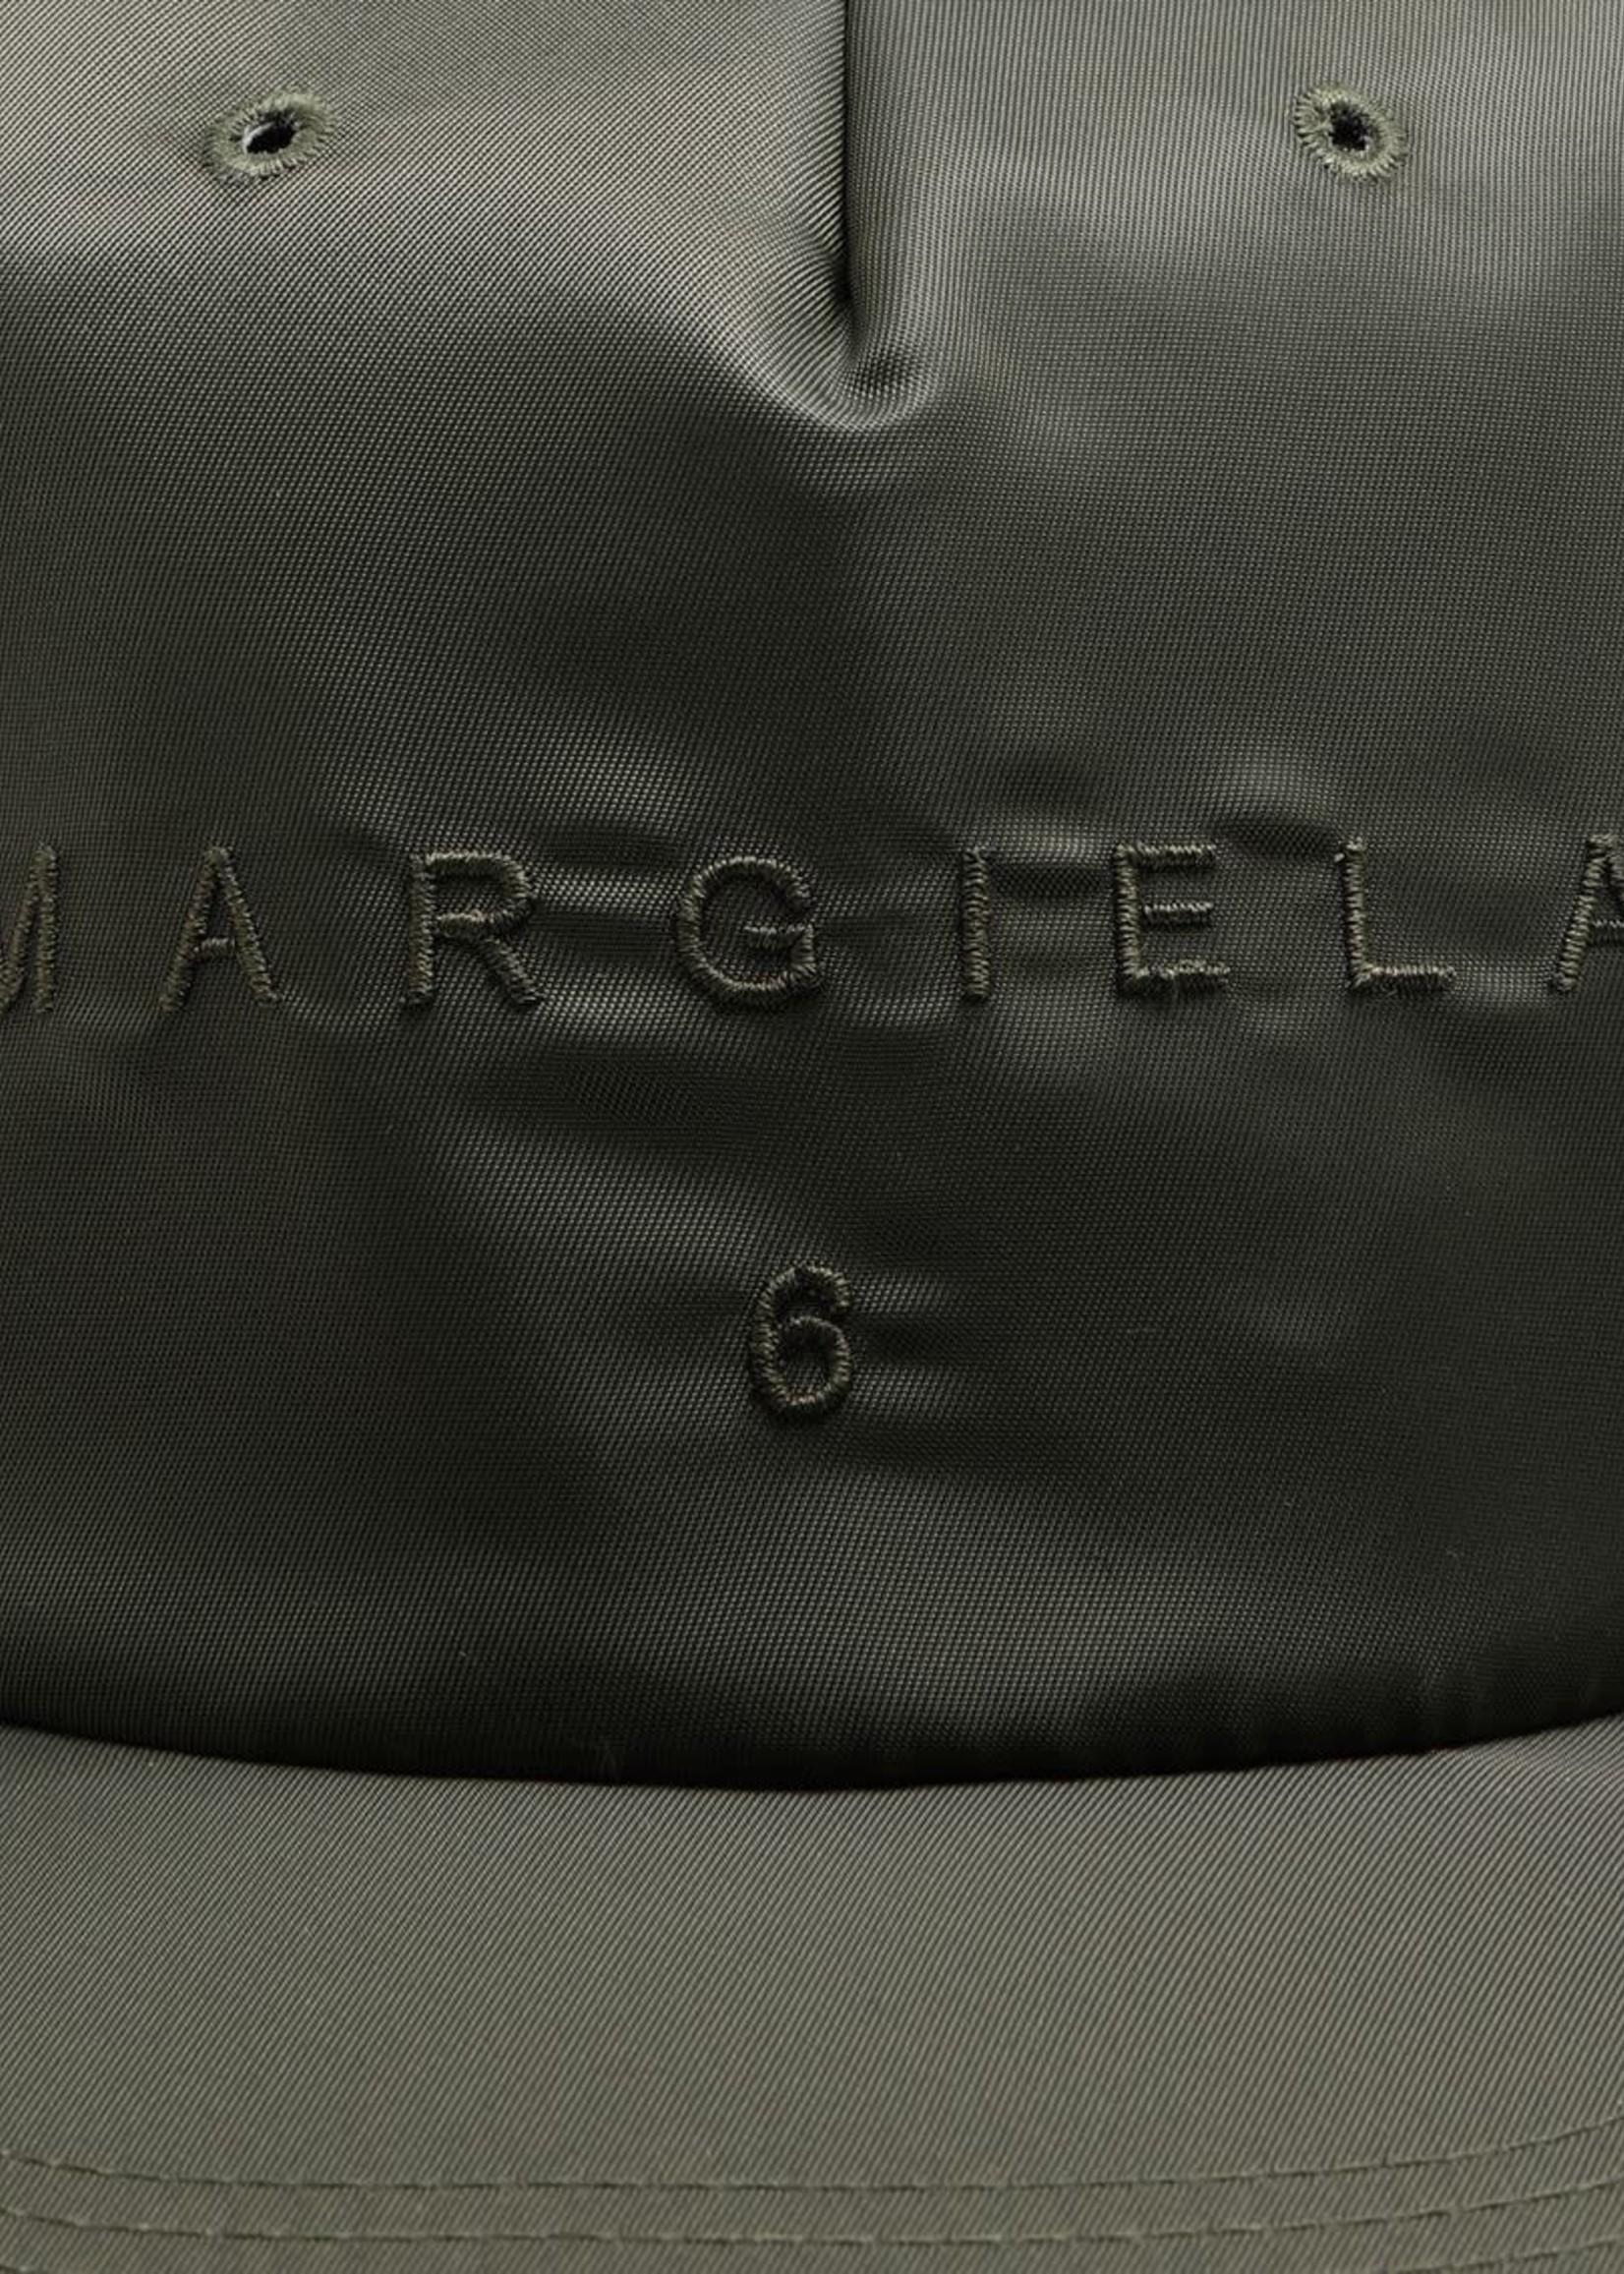 MM6 MAISON MARGIELA Nylon Logo Ball Cap in Military Green